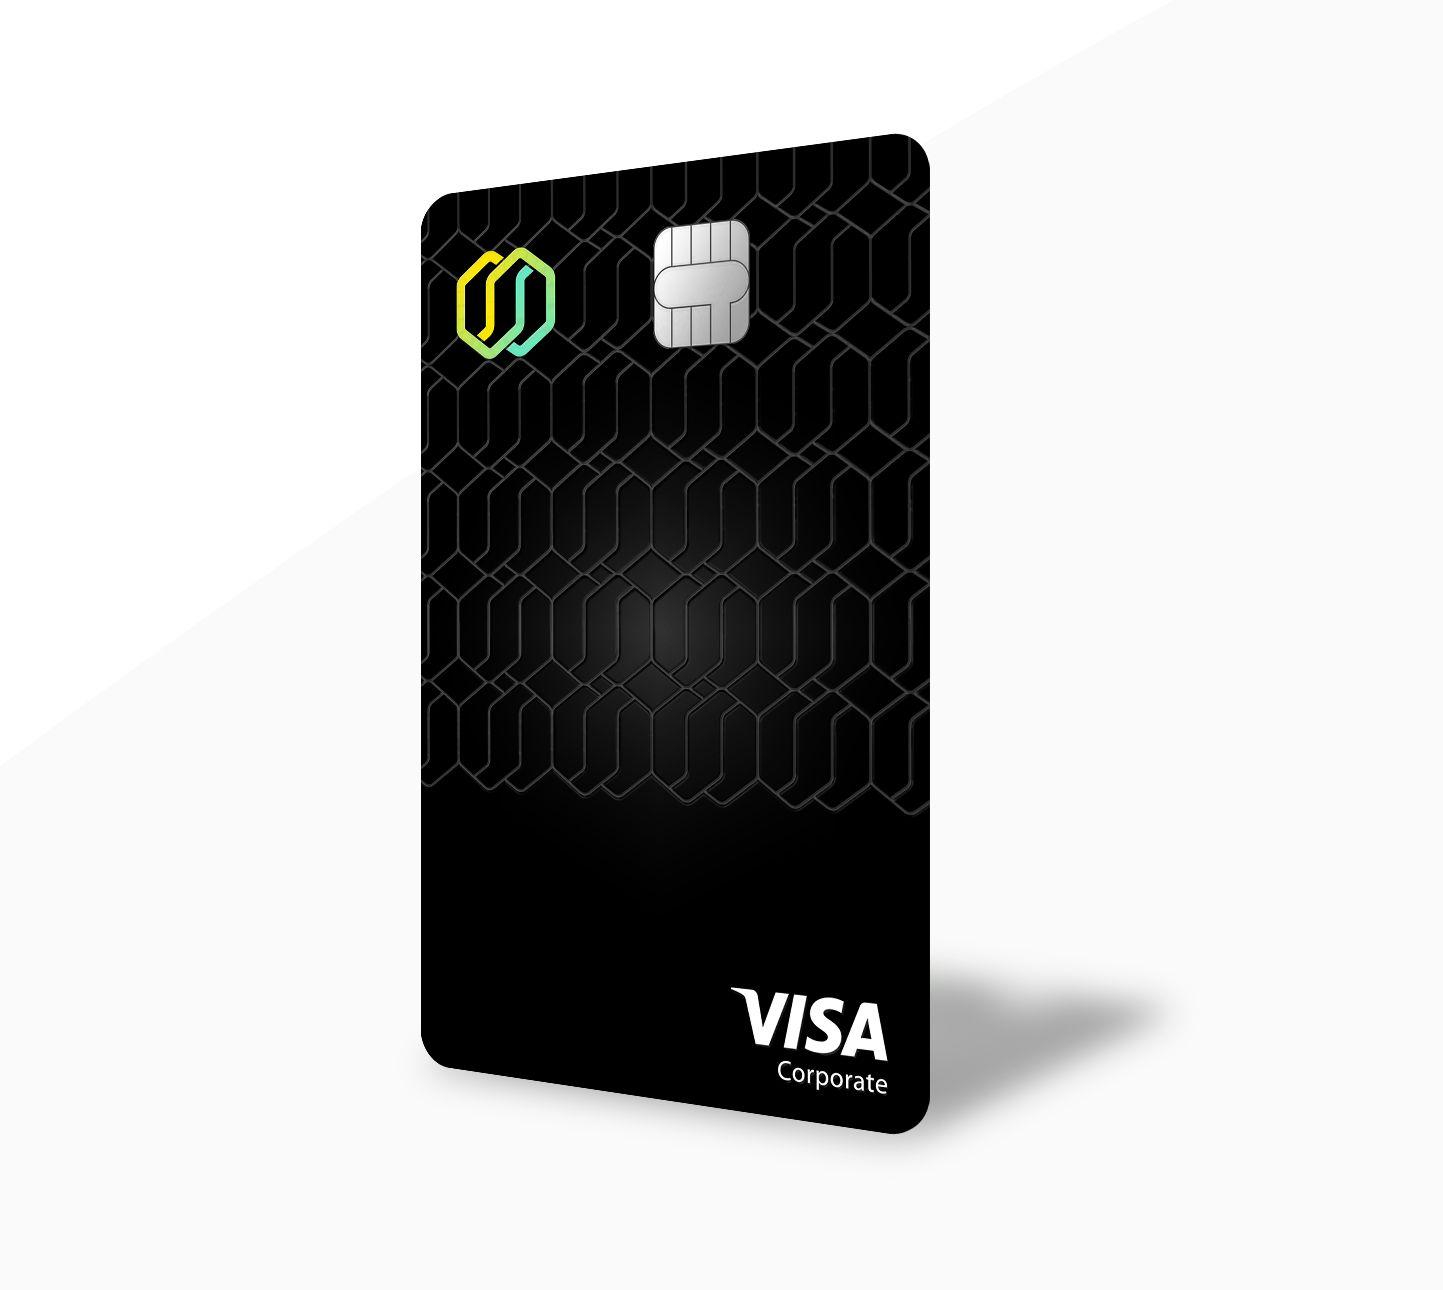 Best Business Credit Cards Design Credit Card Design Business Credit Cards Credit Card